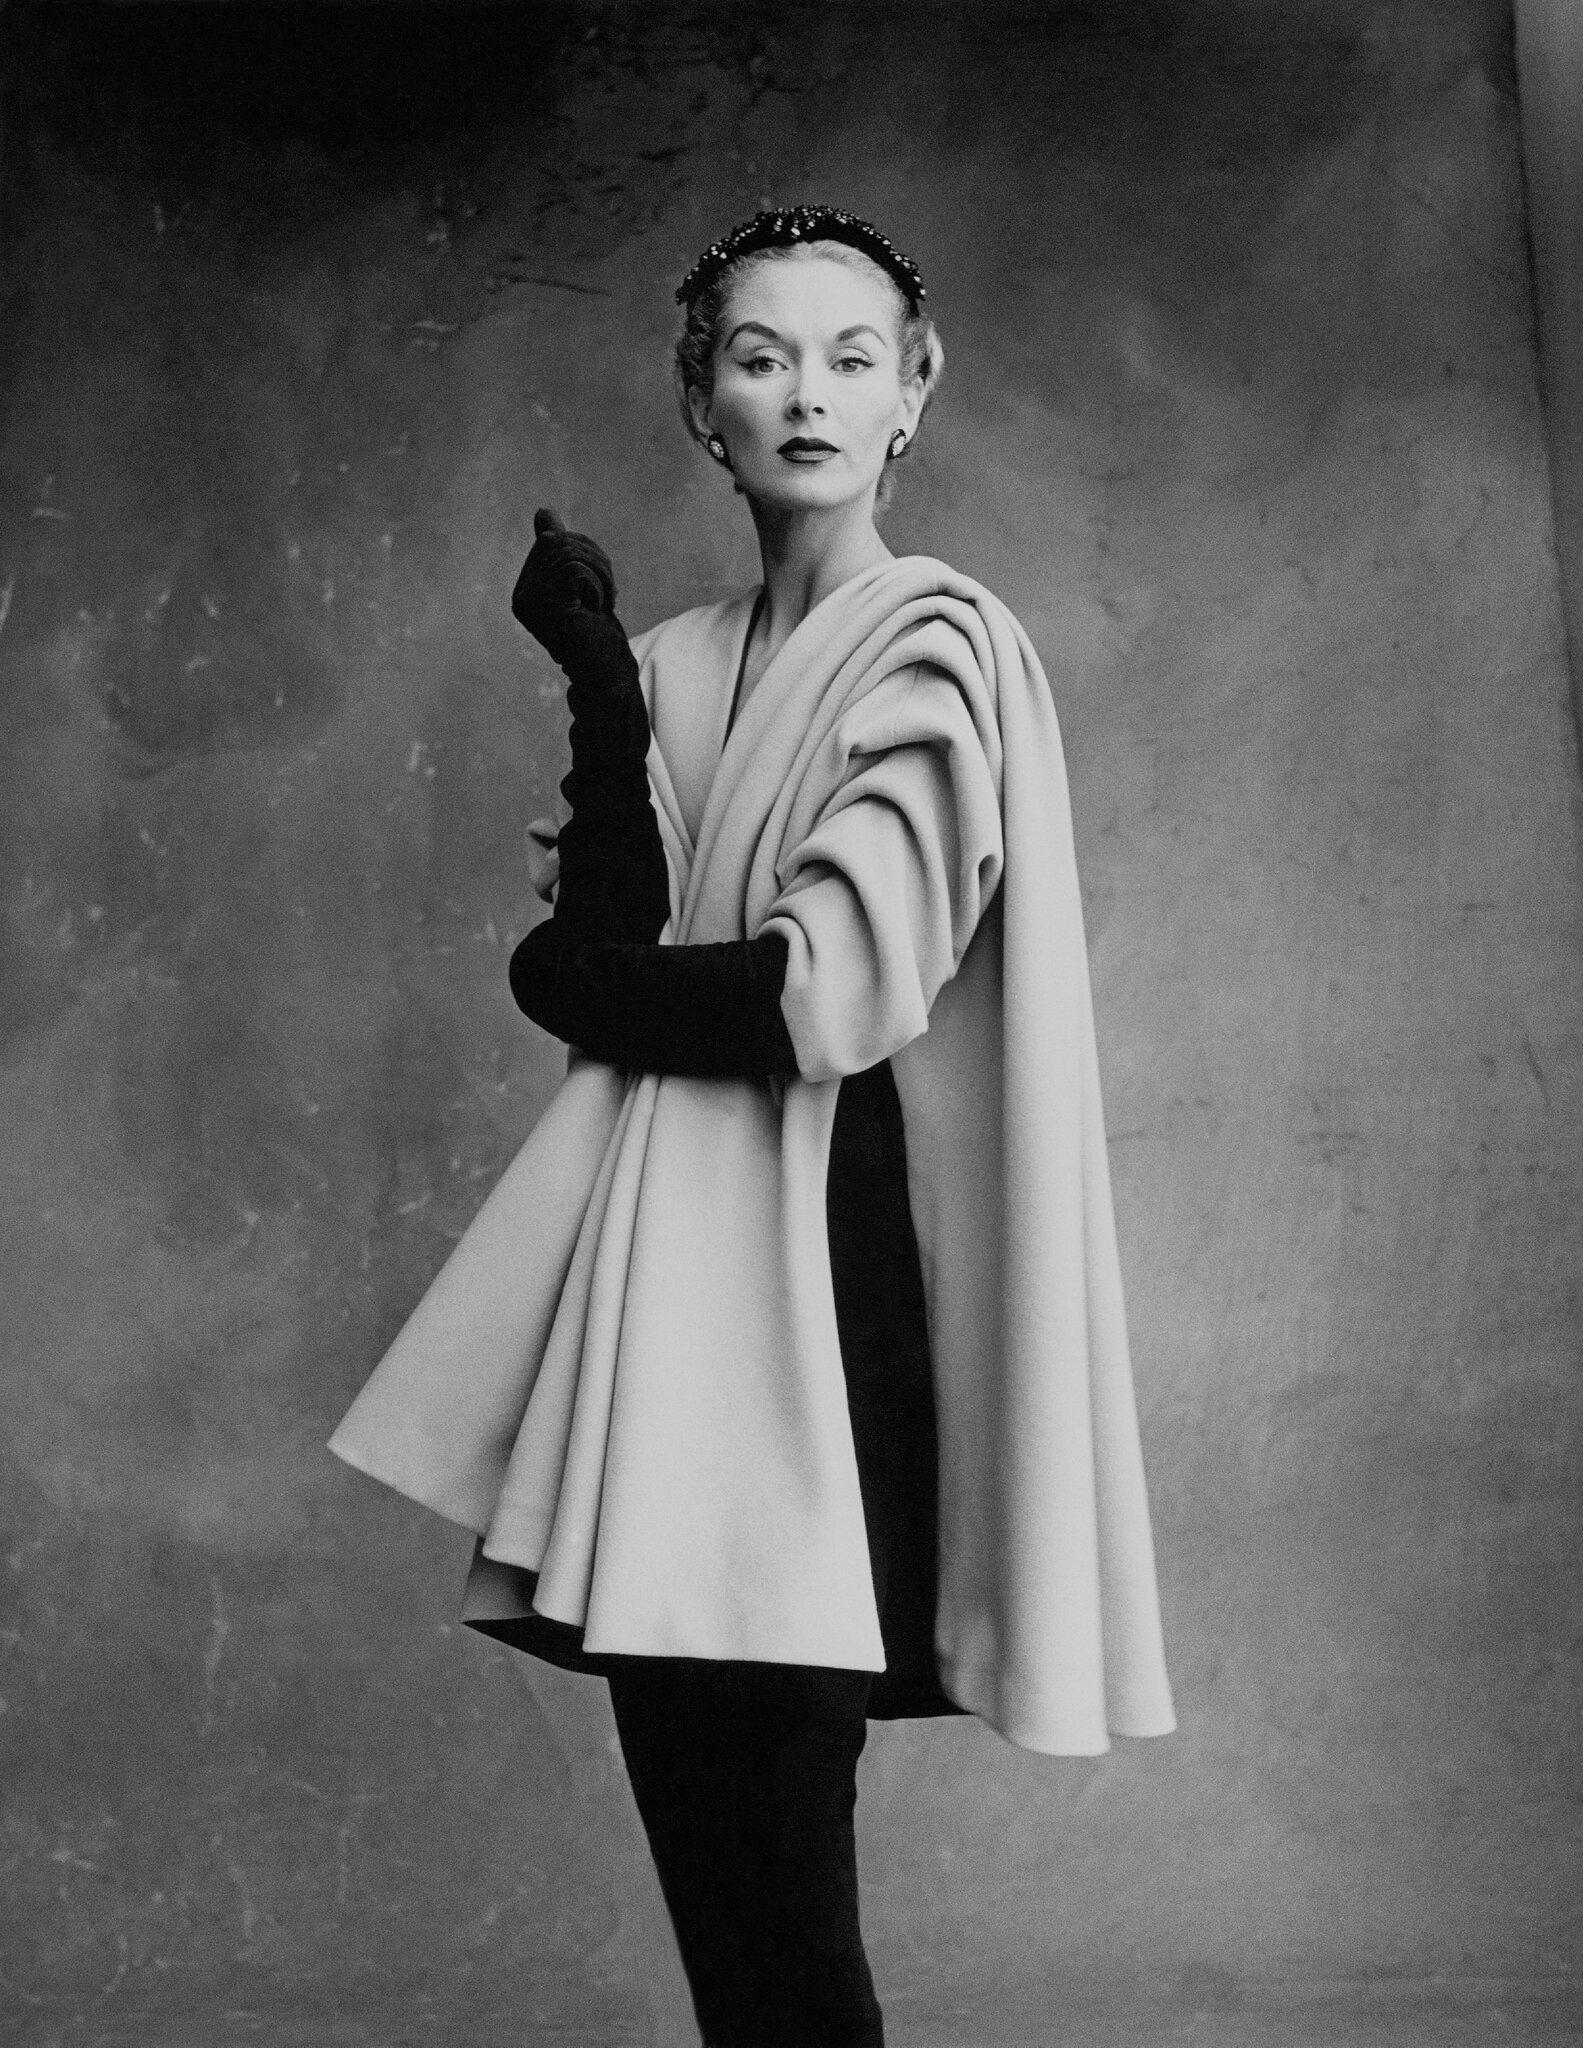 Lisa_Fonssagrives-Penn_wearing_coat_by_Crist├│bal_Balenciaga_Paris_1950